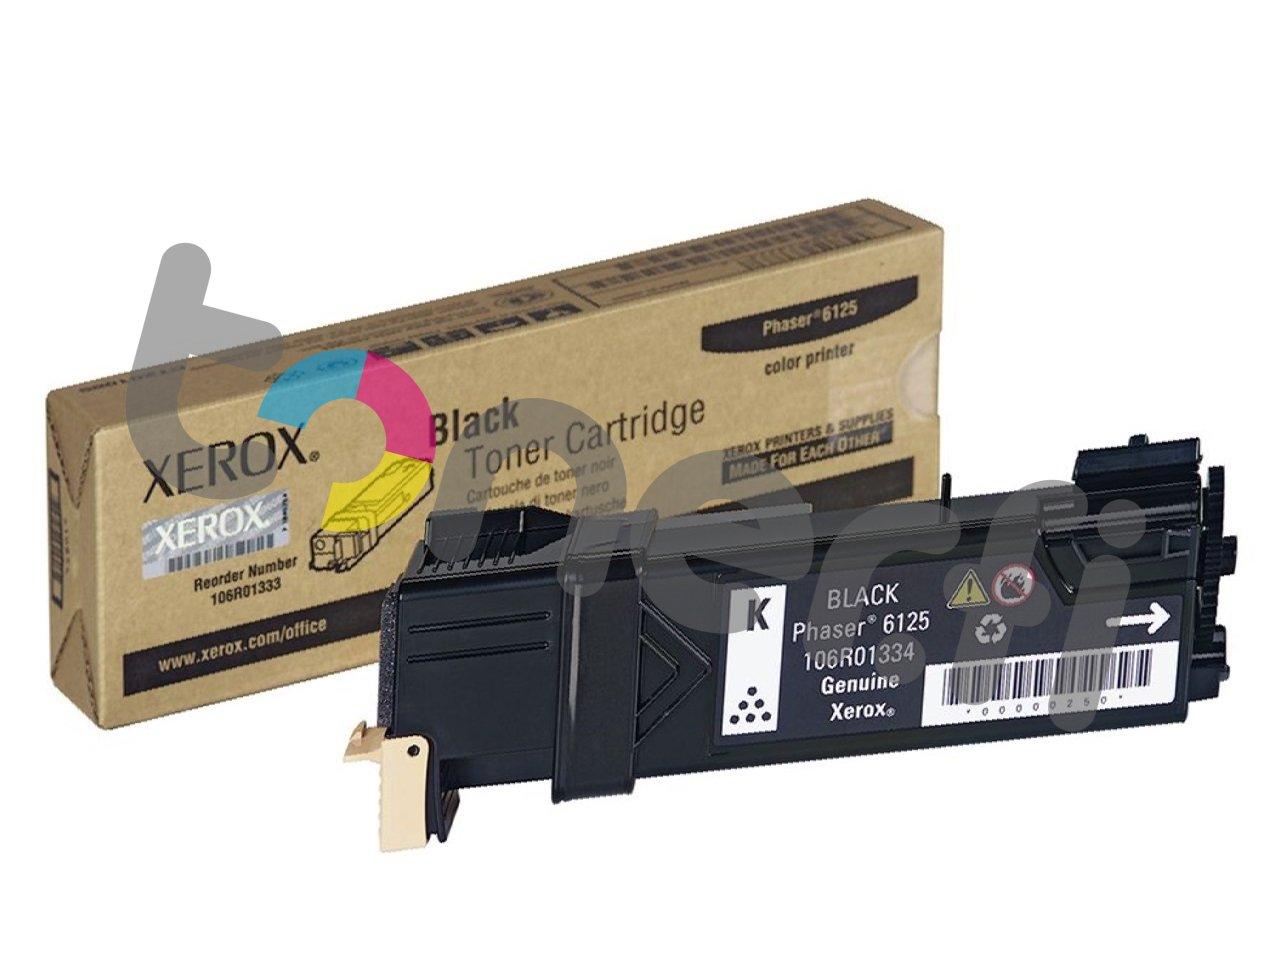 Xerox Phaser 6125 Värikasetti Musta